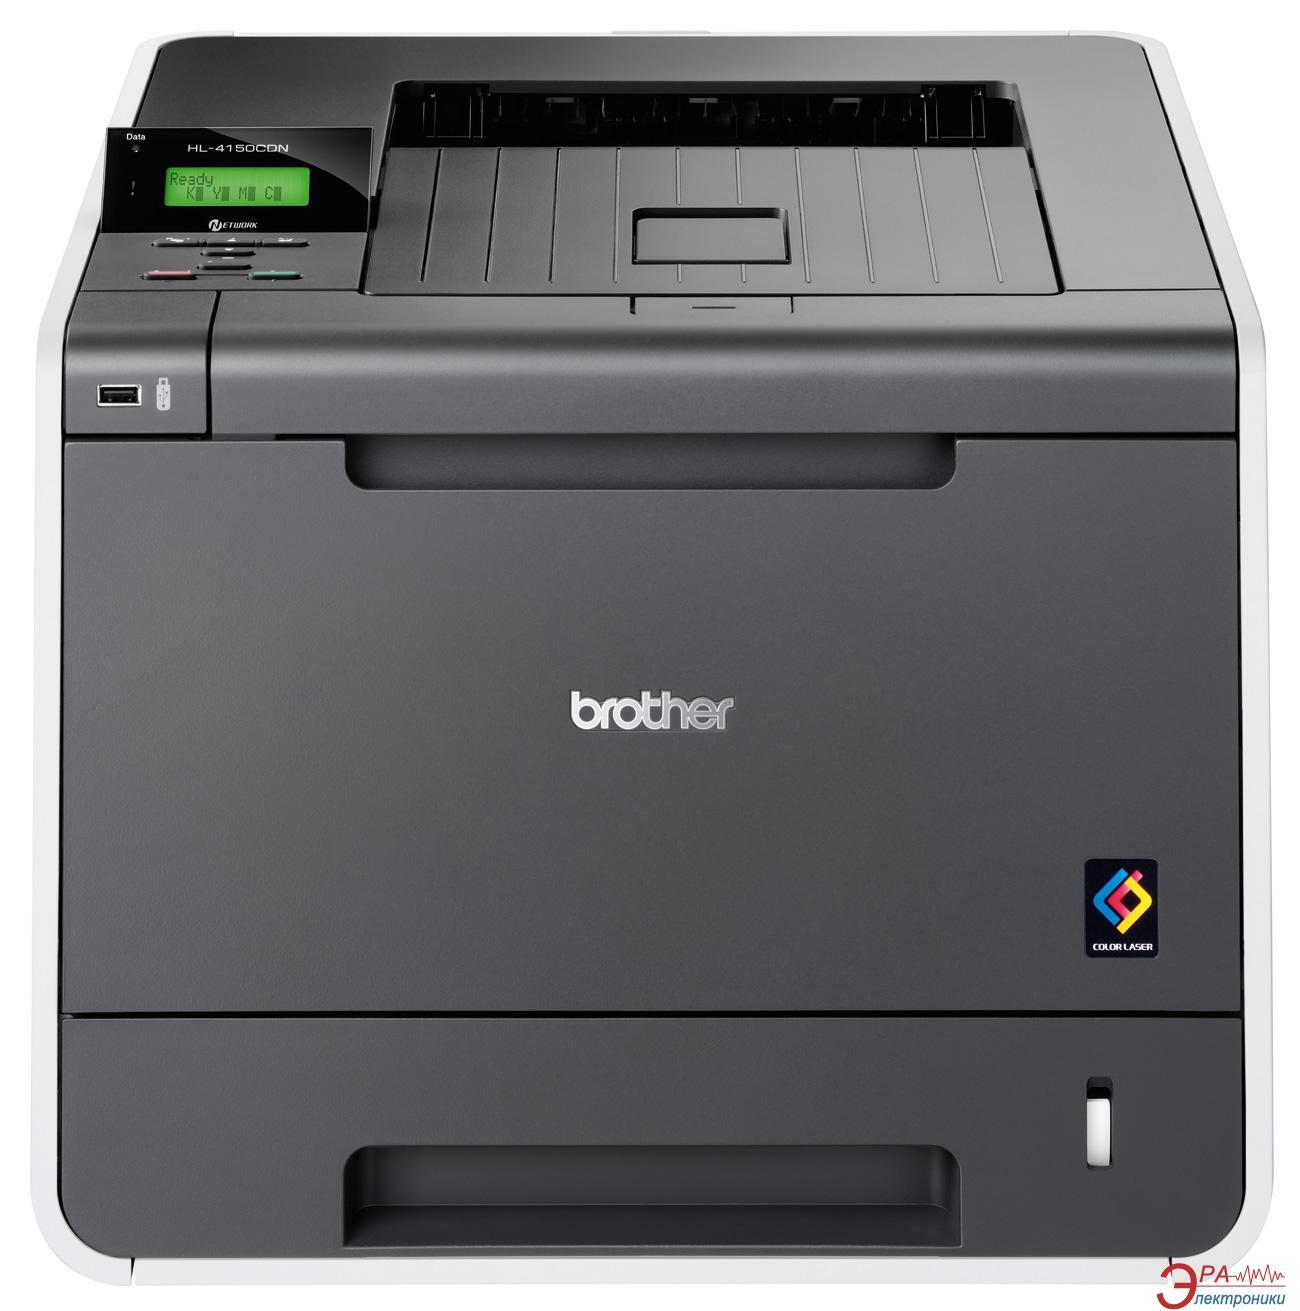 Принтер A4 Brother HL-4150CDN (HL4150CDNR1)